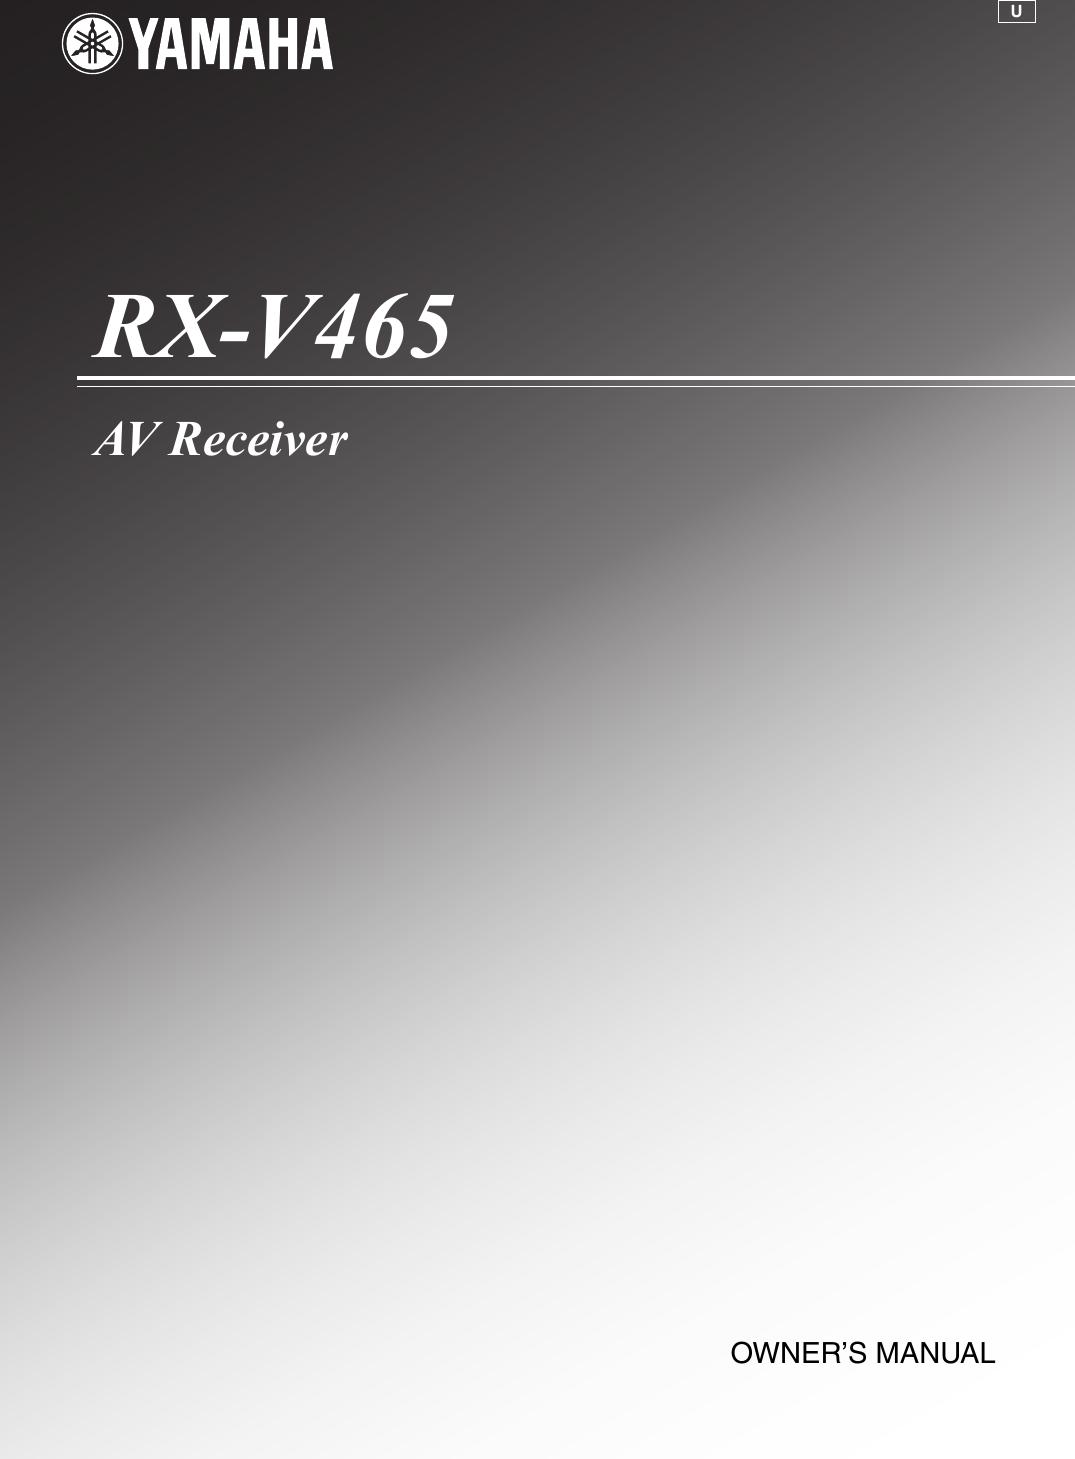 Yamaha RX V465 Owners Manual